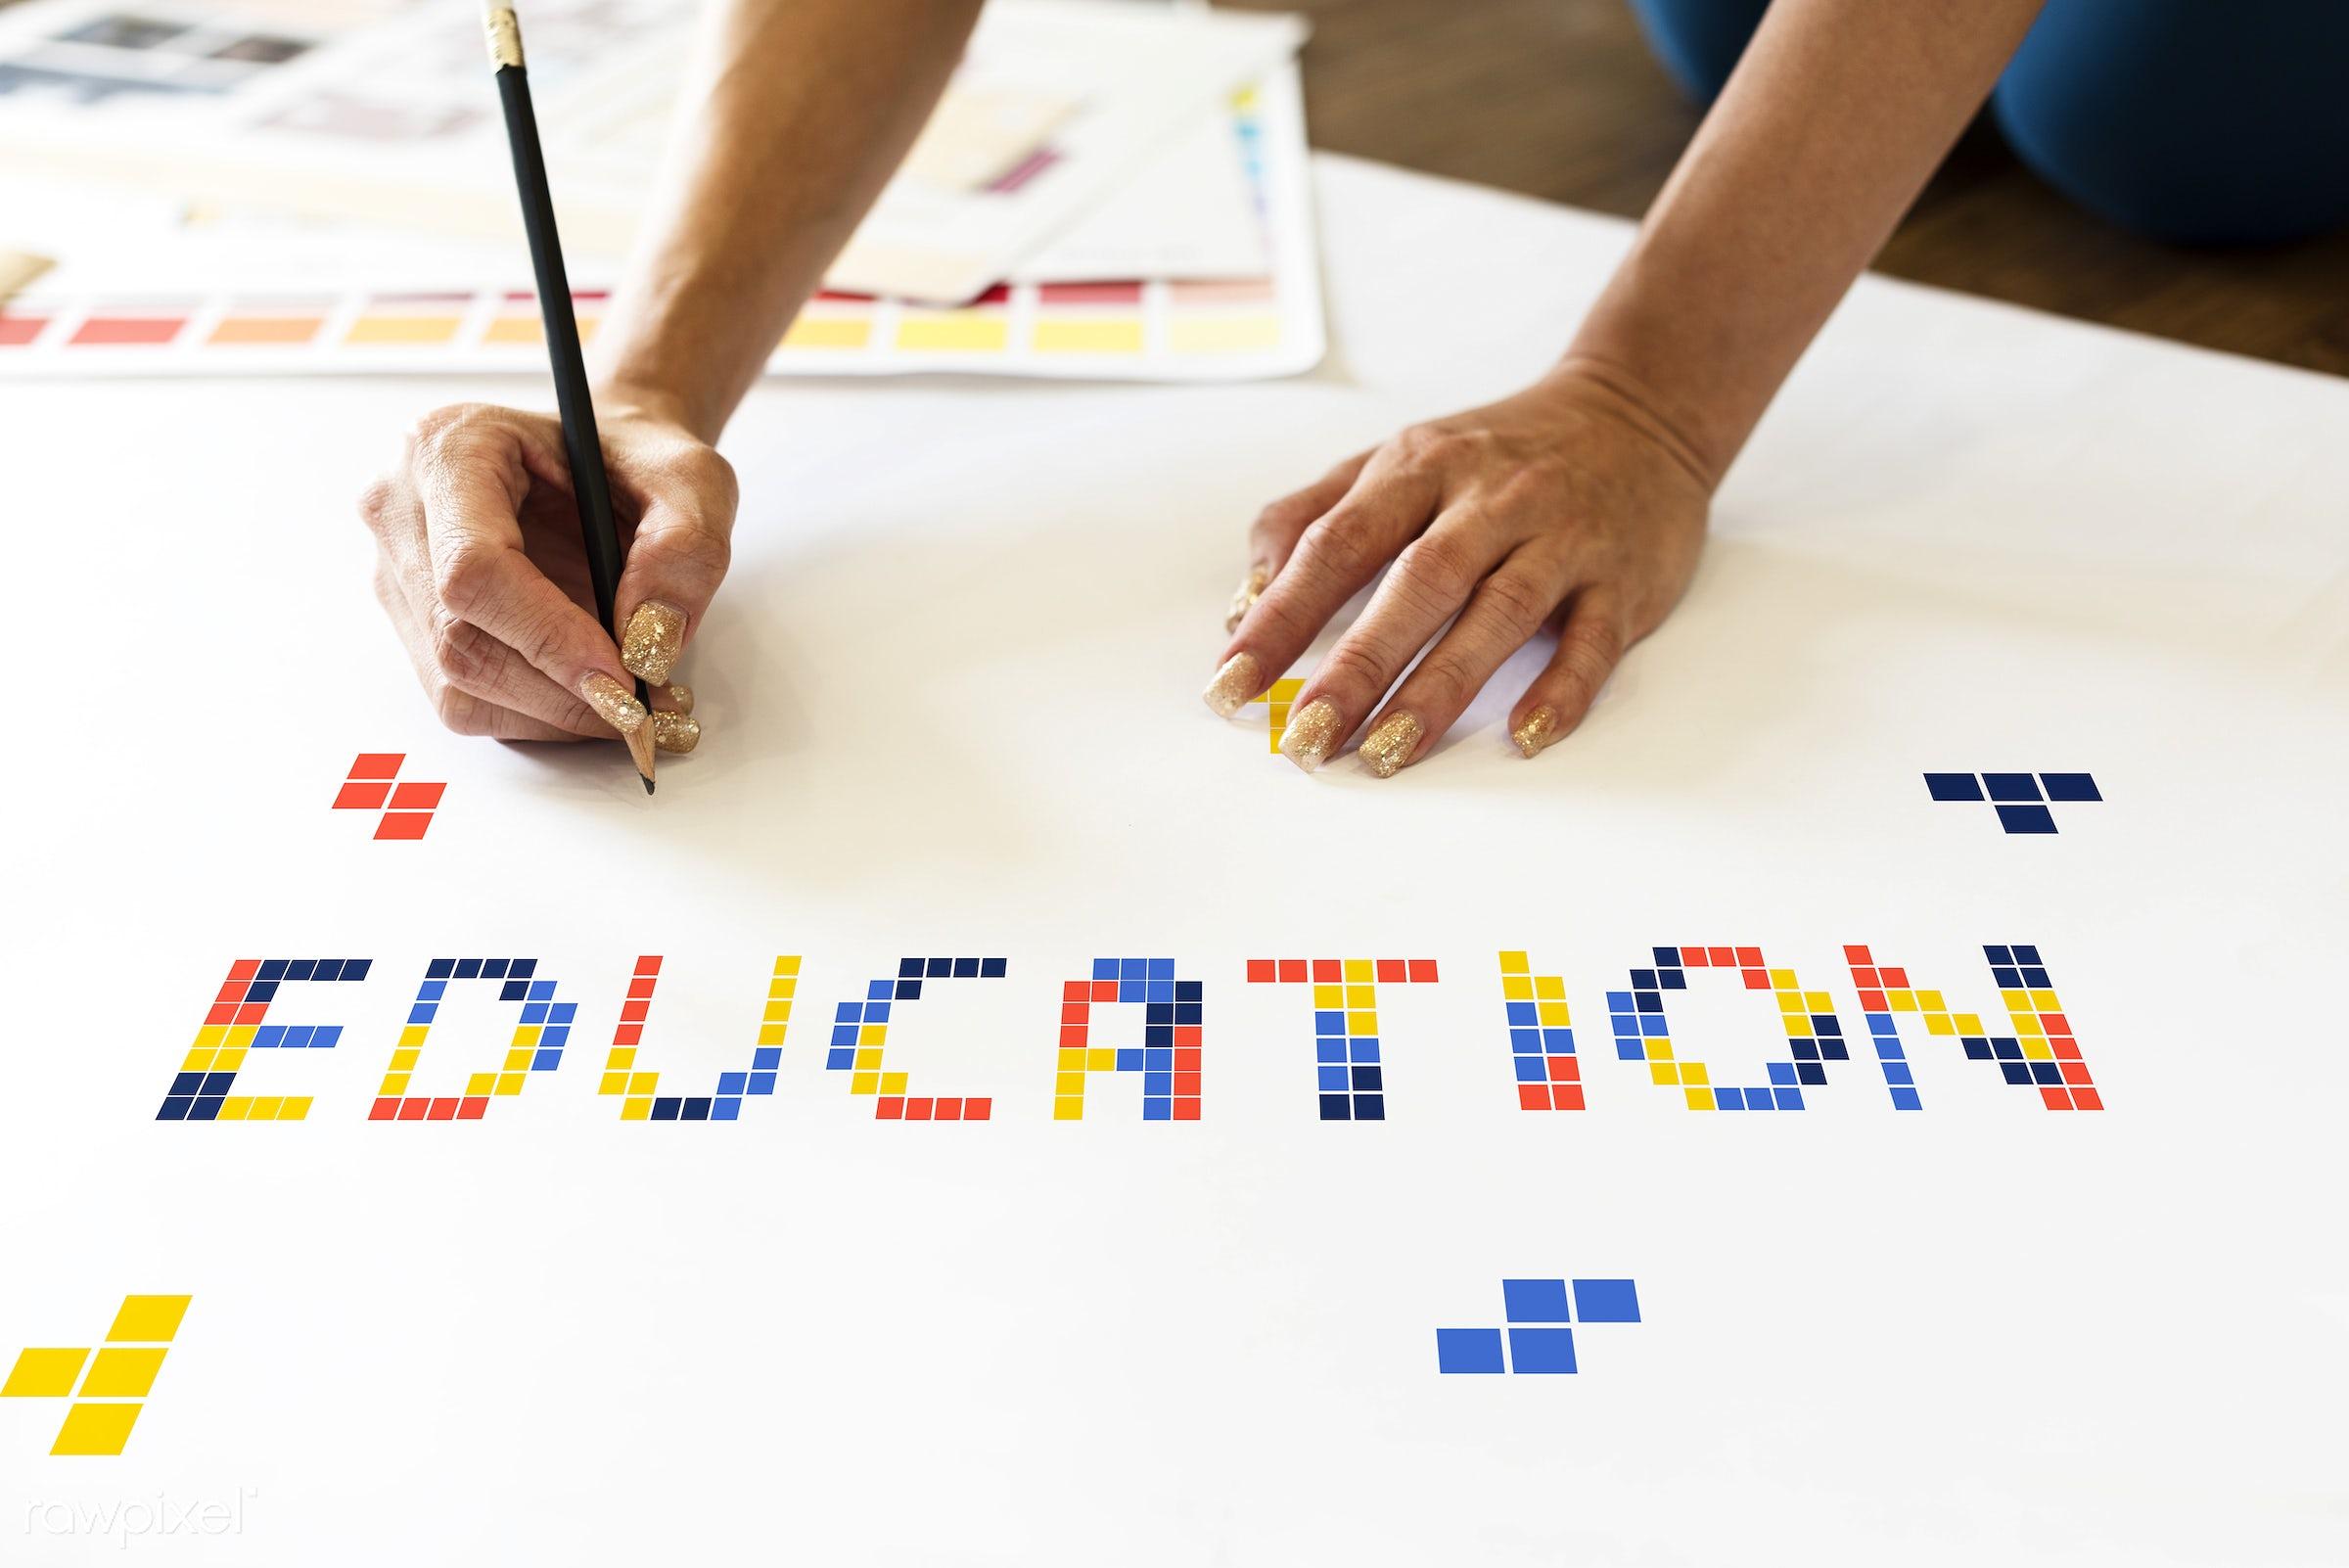 8 bit, academics, art, block, creation, creative, creativity, design, drawing, education, game, graphic, hands, ideas,...